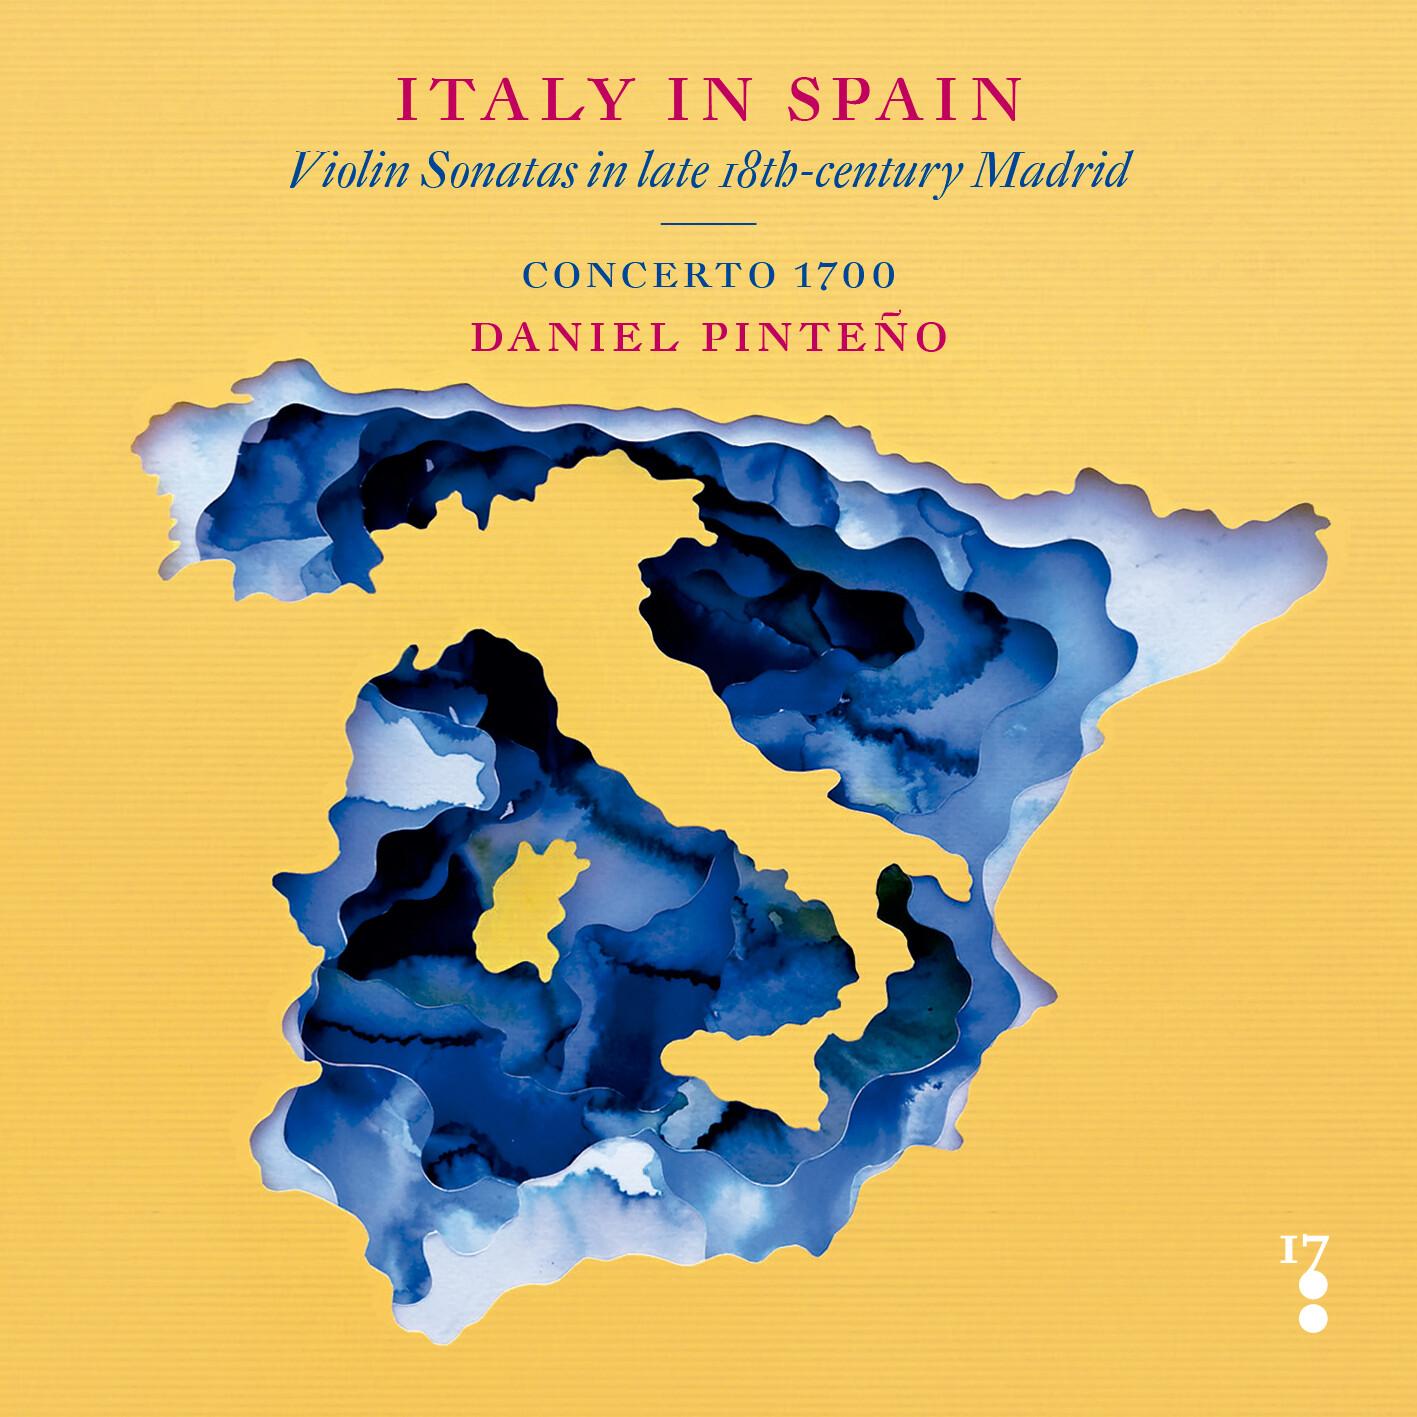 ITALY IN SPAIN: Violin Sonatas in late 18th-century Madrid